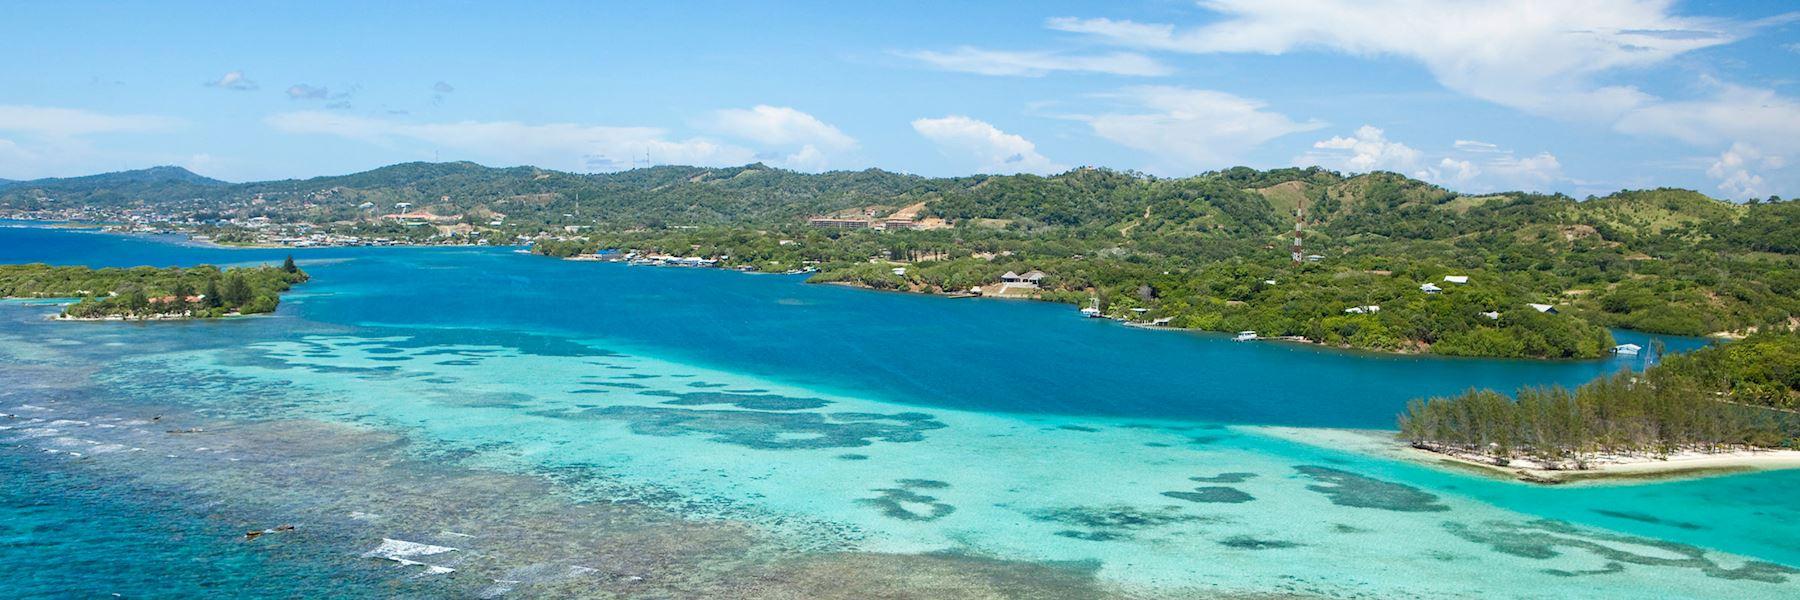 Honduras vacations